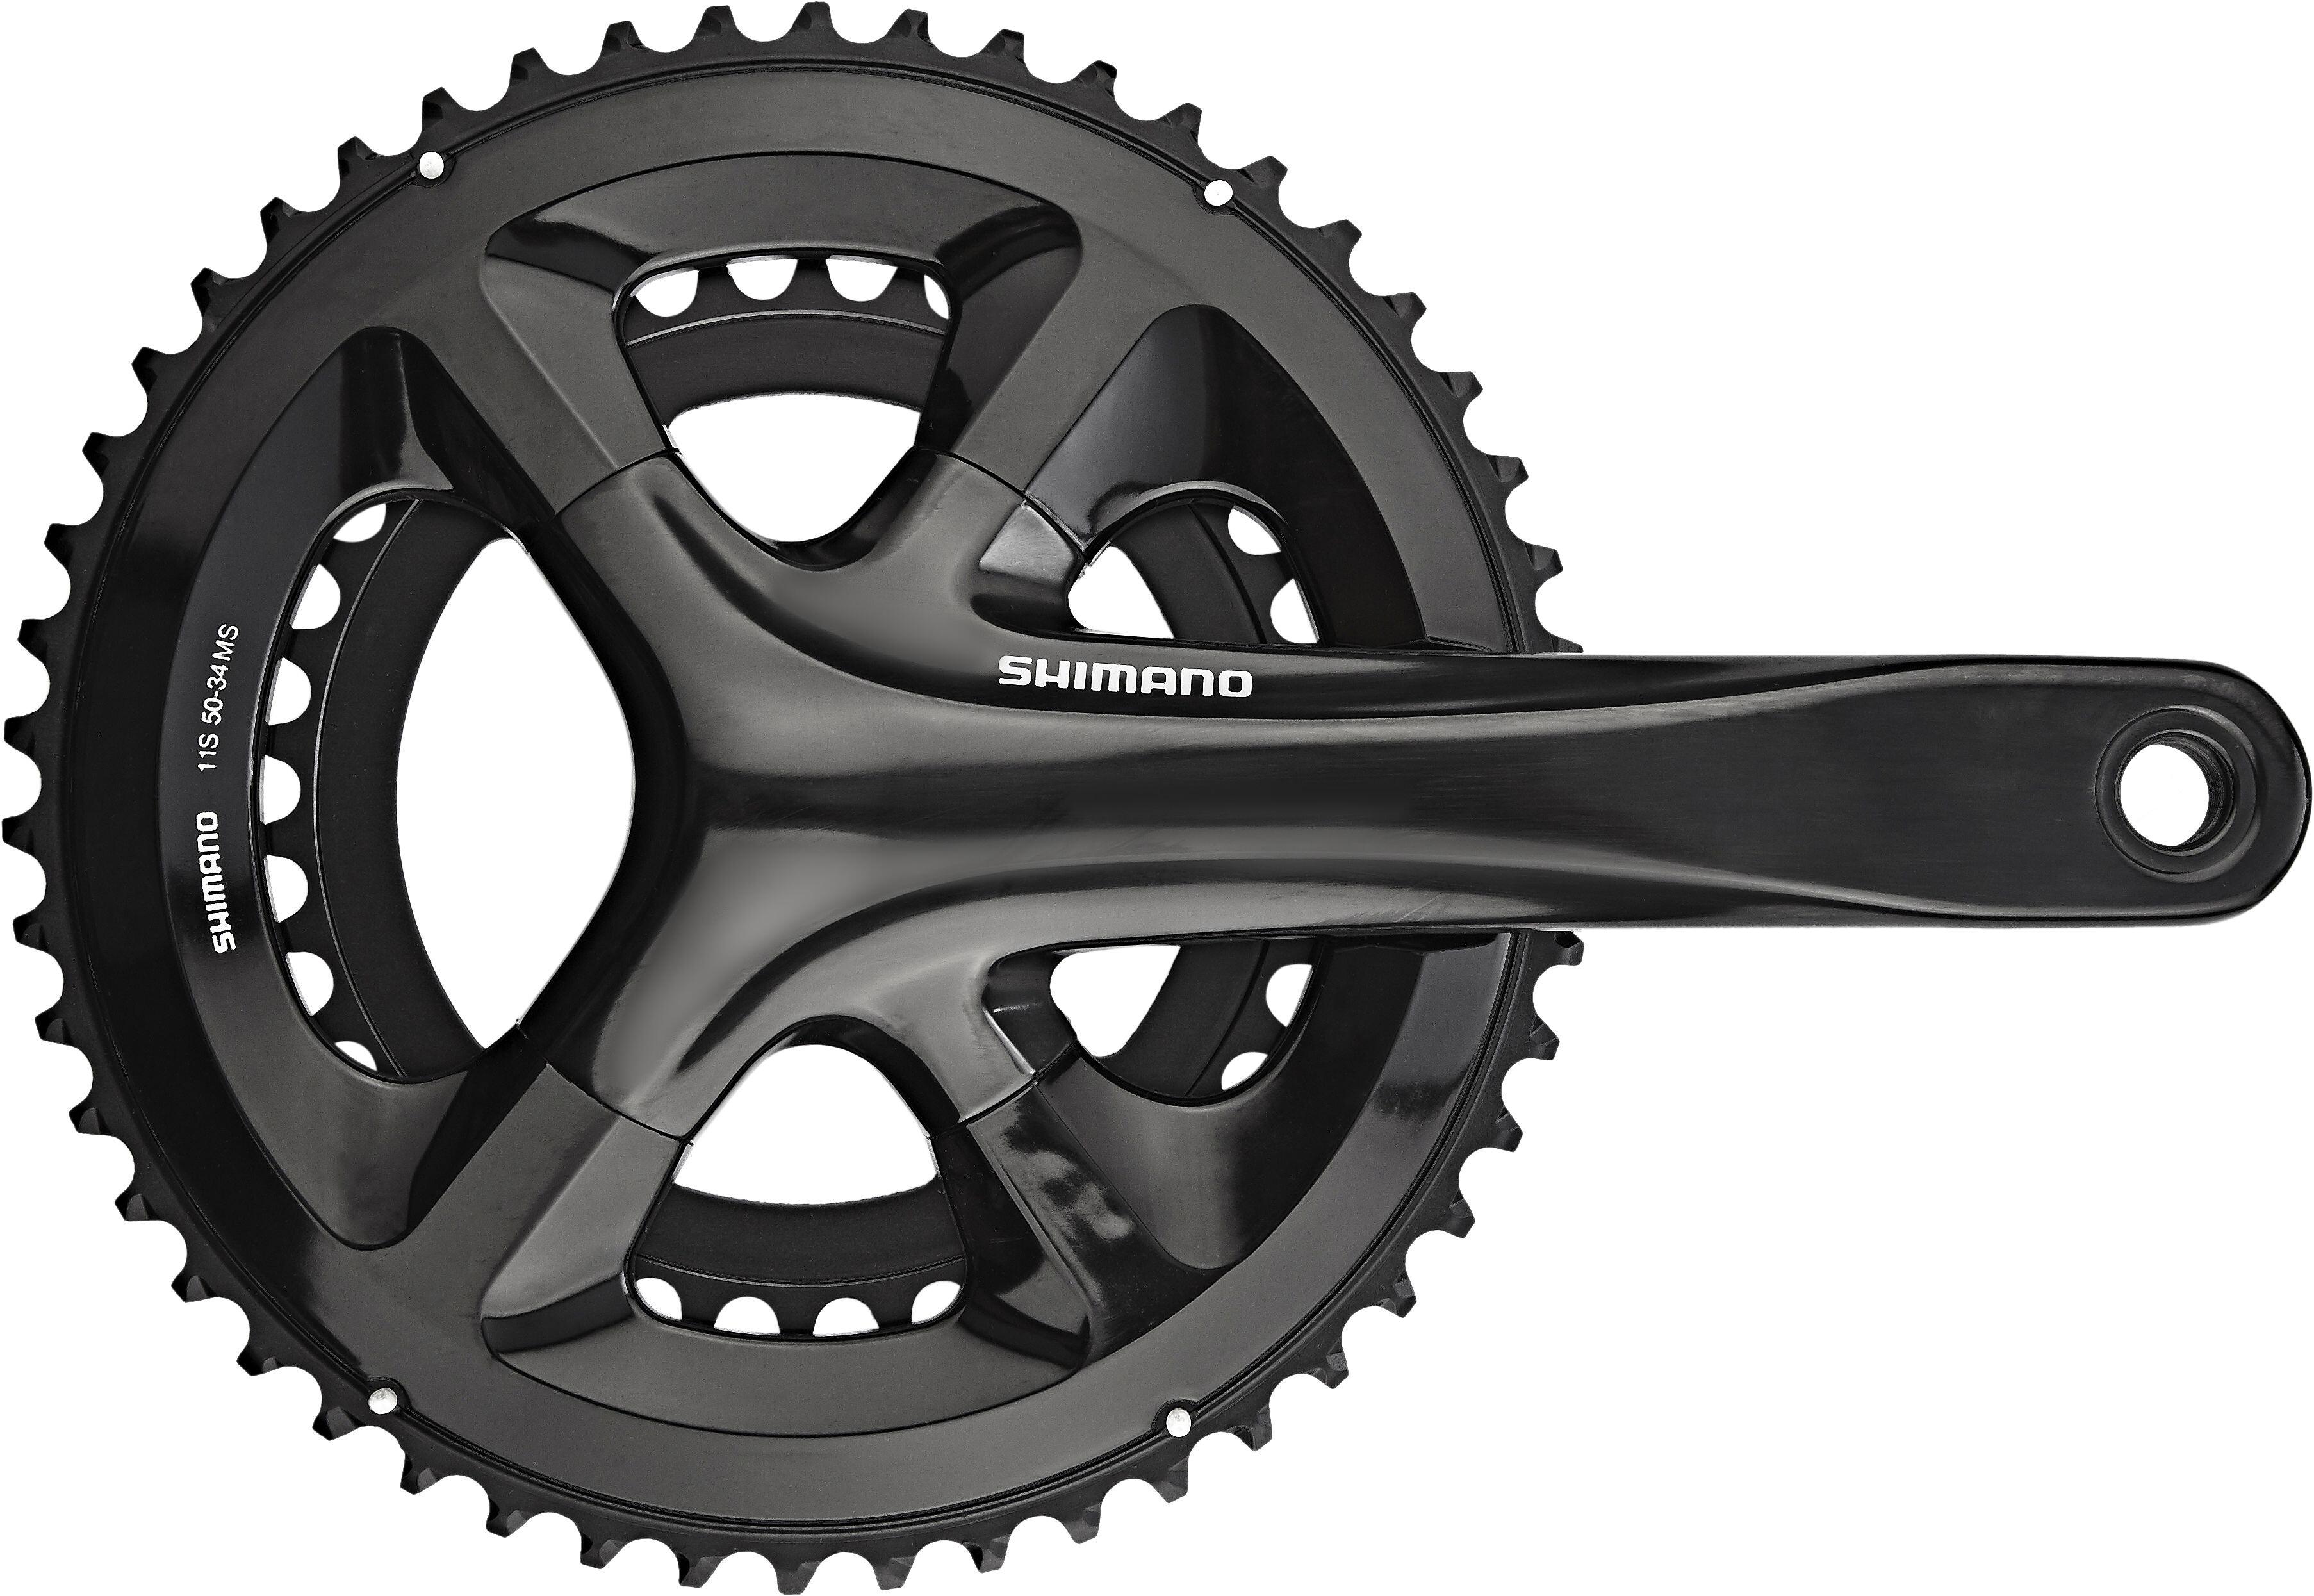 Shimano Road Fc Rs510 Crank Set 2x11 50 34 Tooth Black At Bikester Co Uk